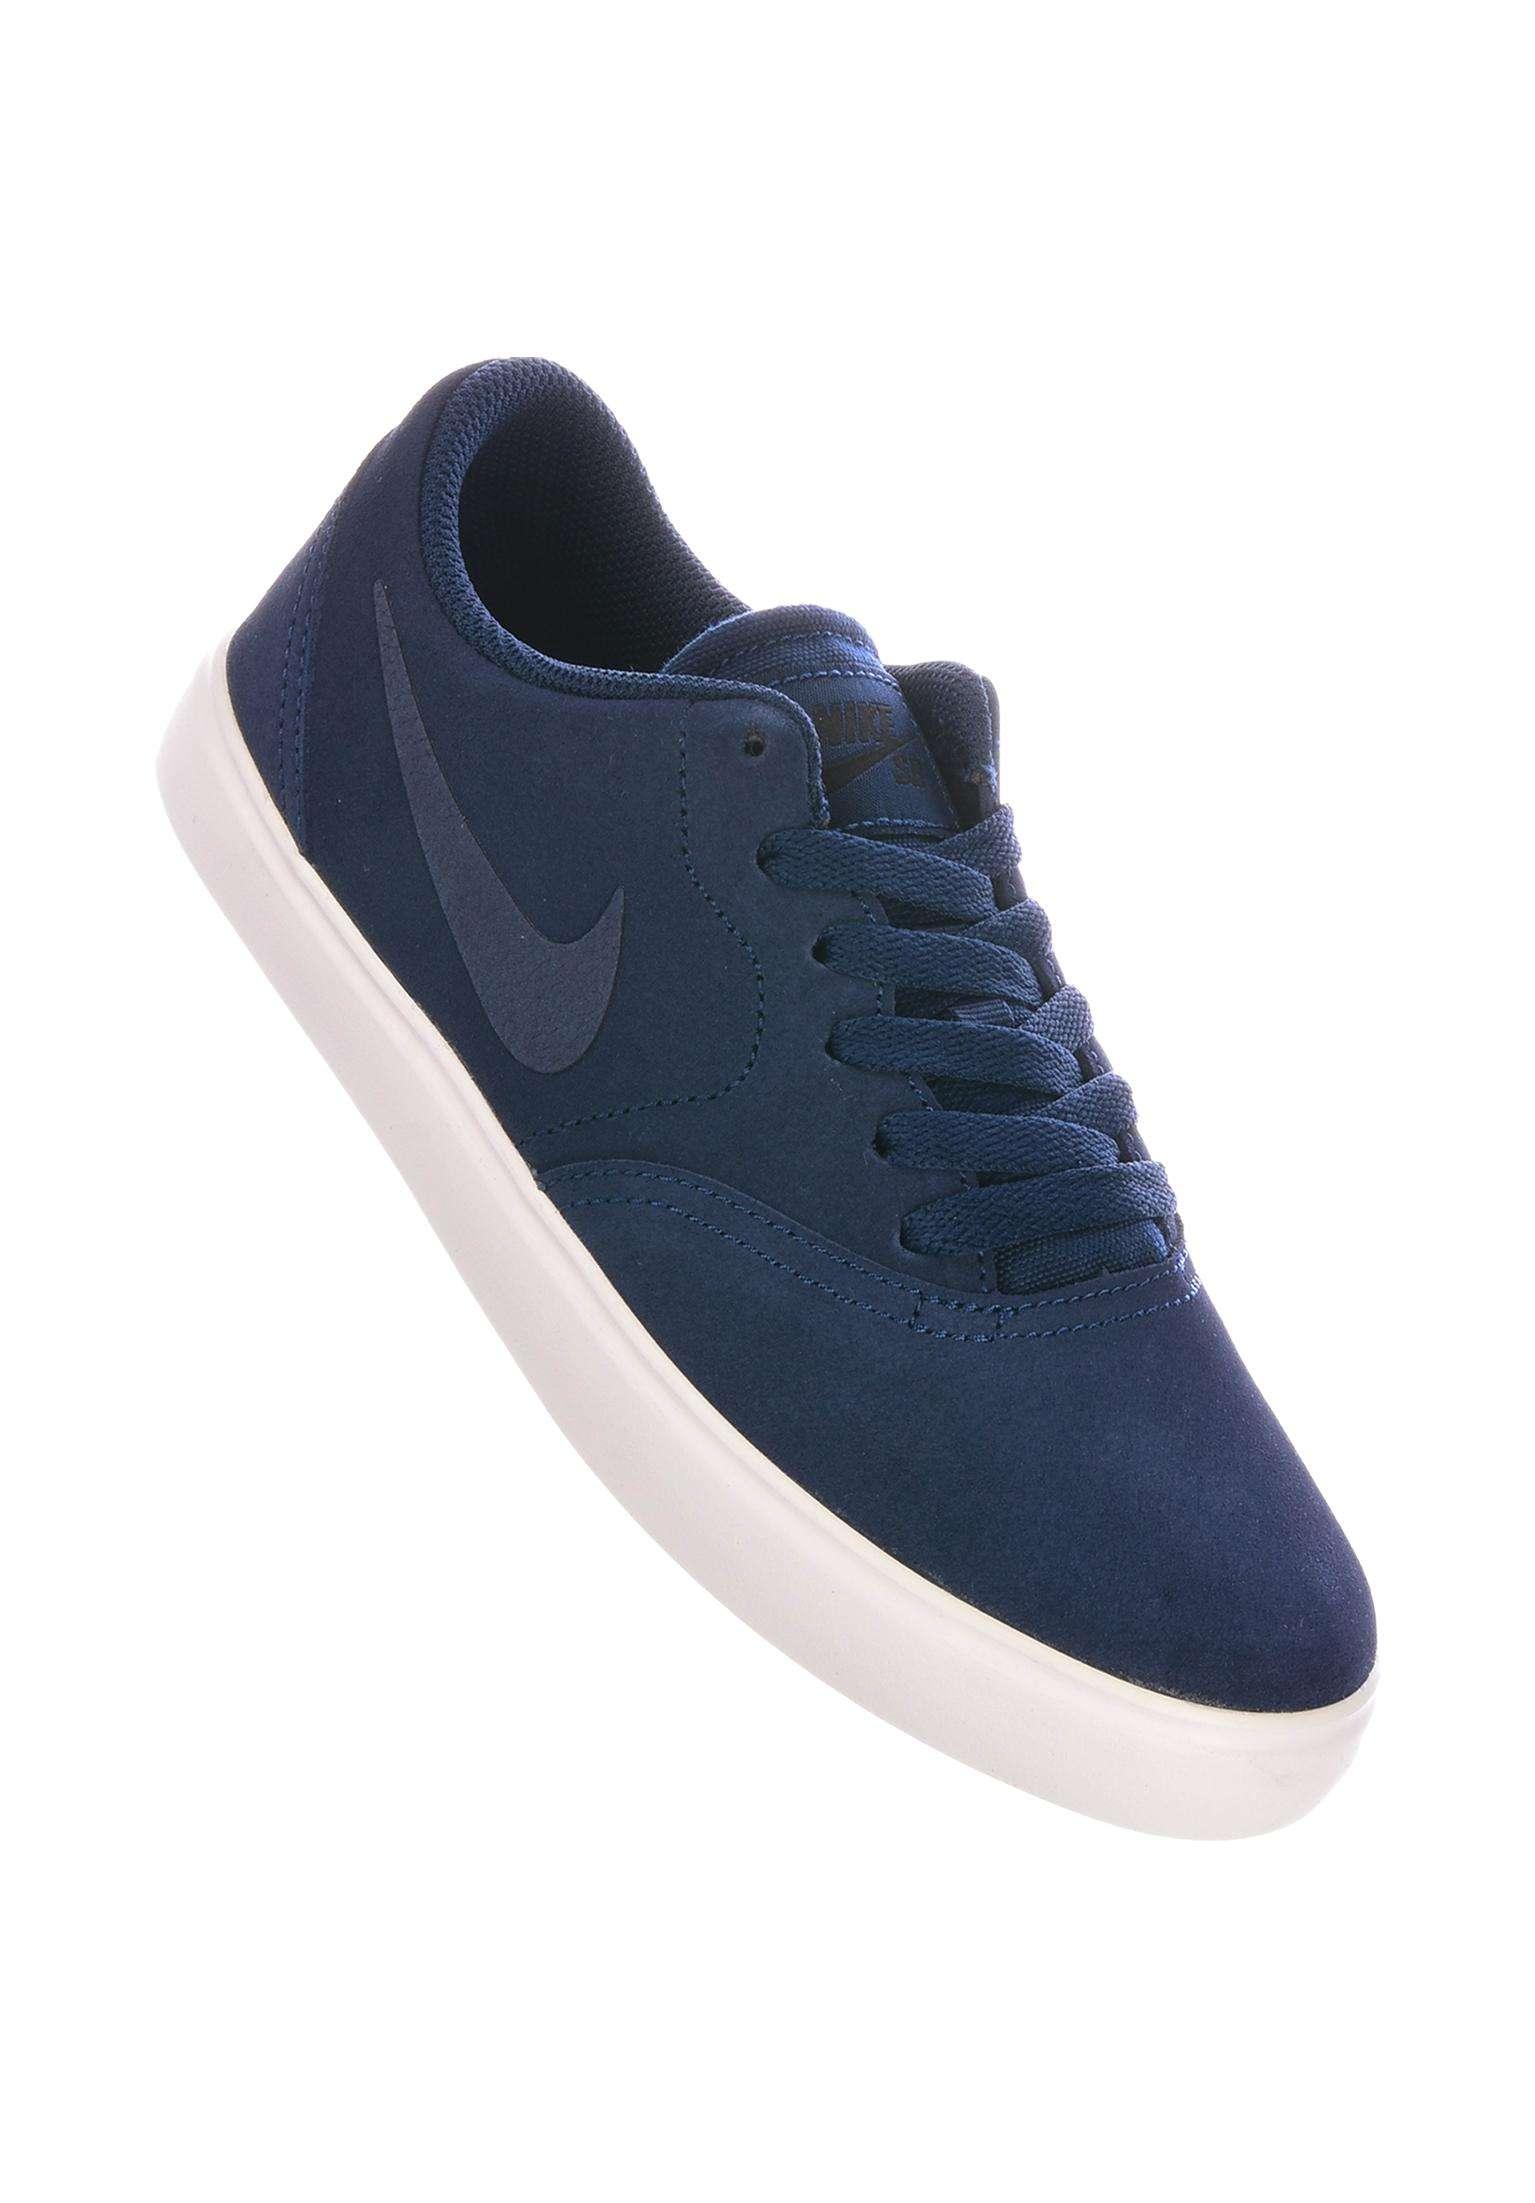 946e134da63 Check GS Nike SB All Shoes in midnightnavy-white for Kids